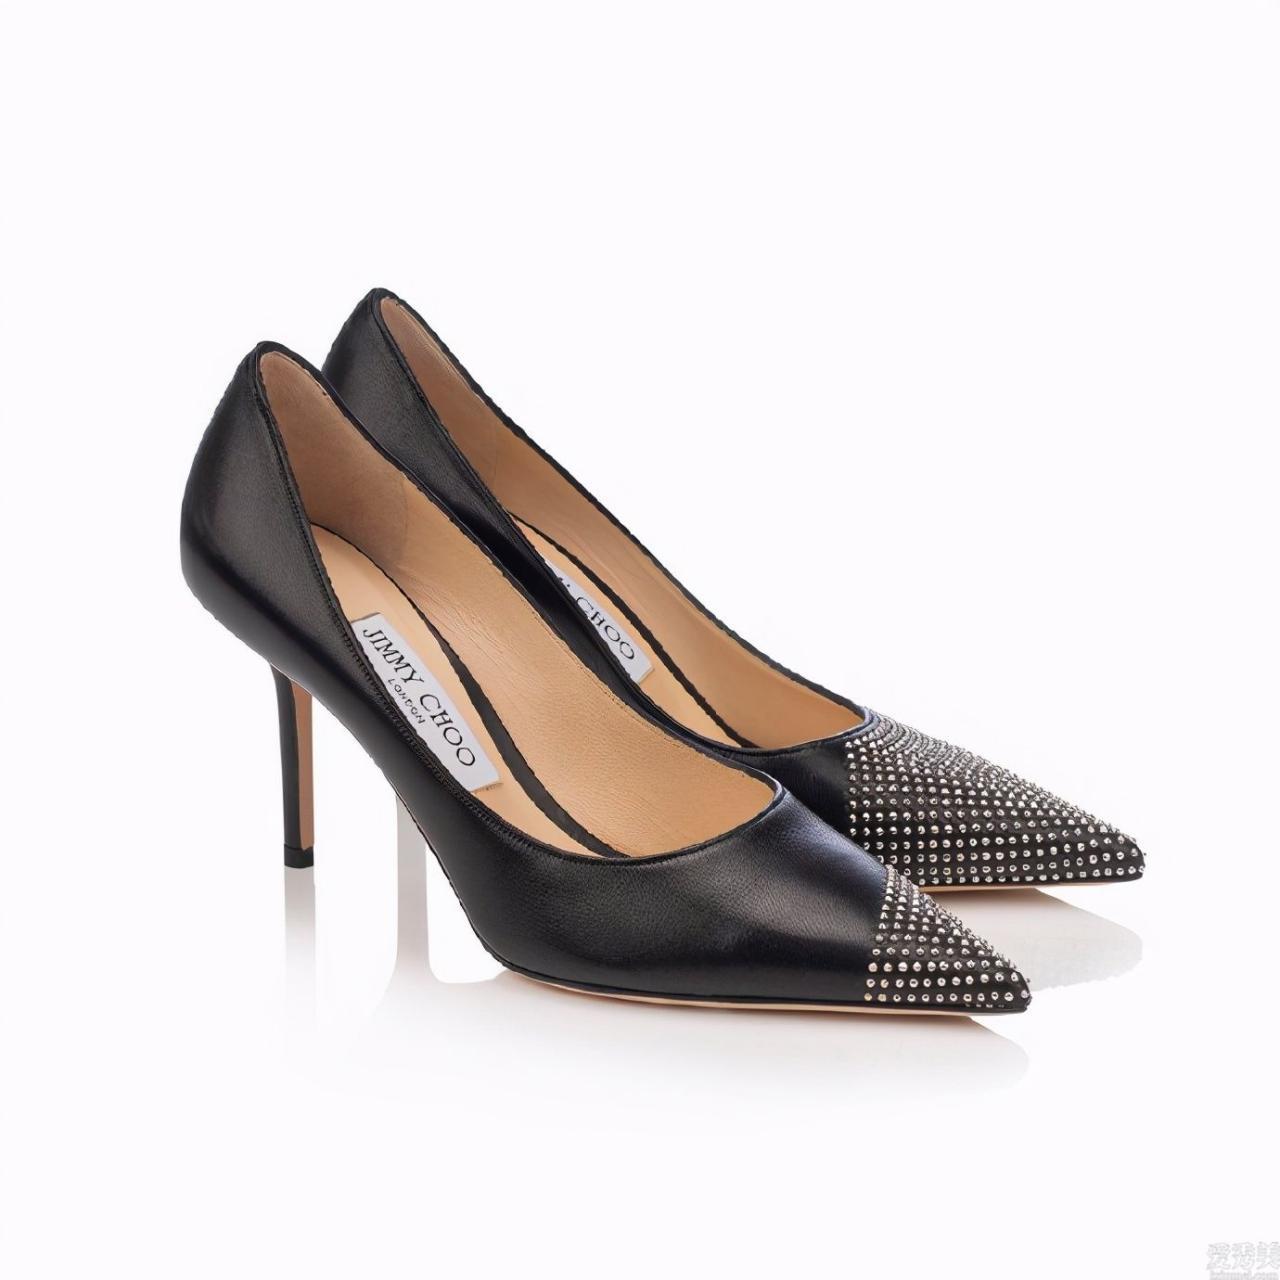 JimmyChoo最新款高跟鞋有什麼非常值得青睞?宋茜用性感對你說